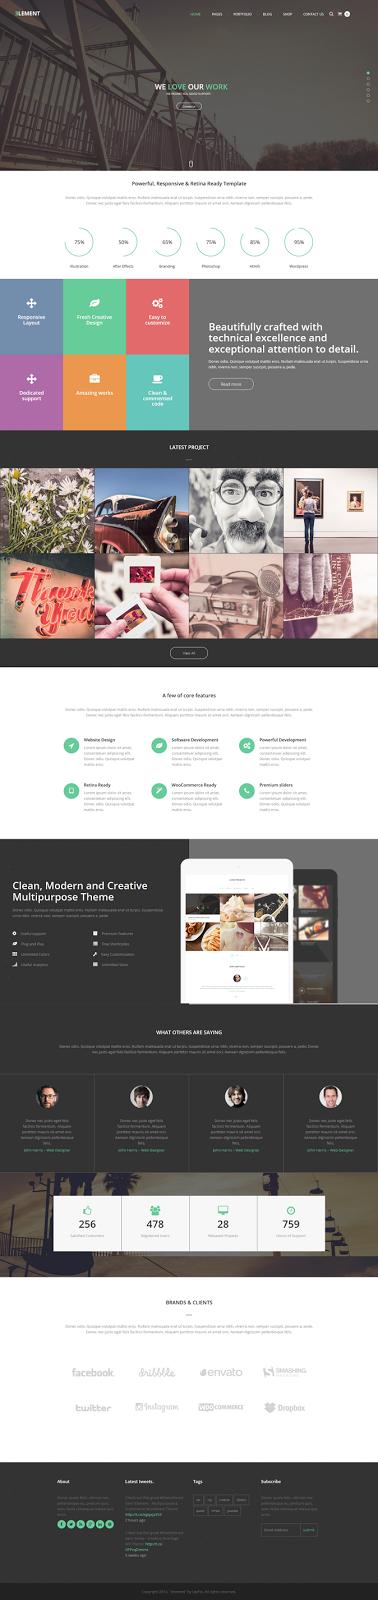 Free Responsive Multipurpose WordPress Theme